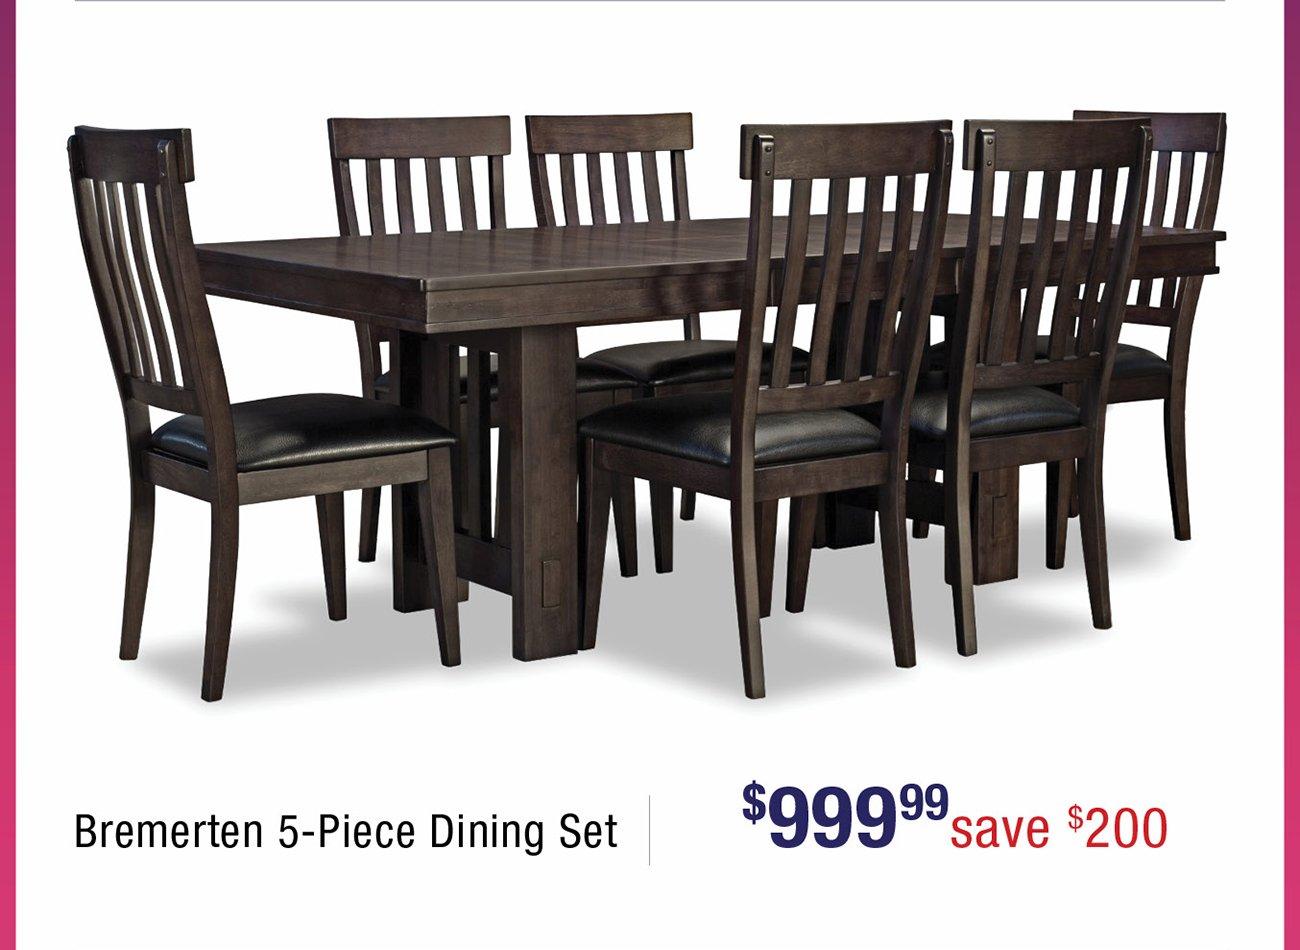 Bremerton-dining-set